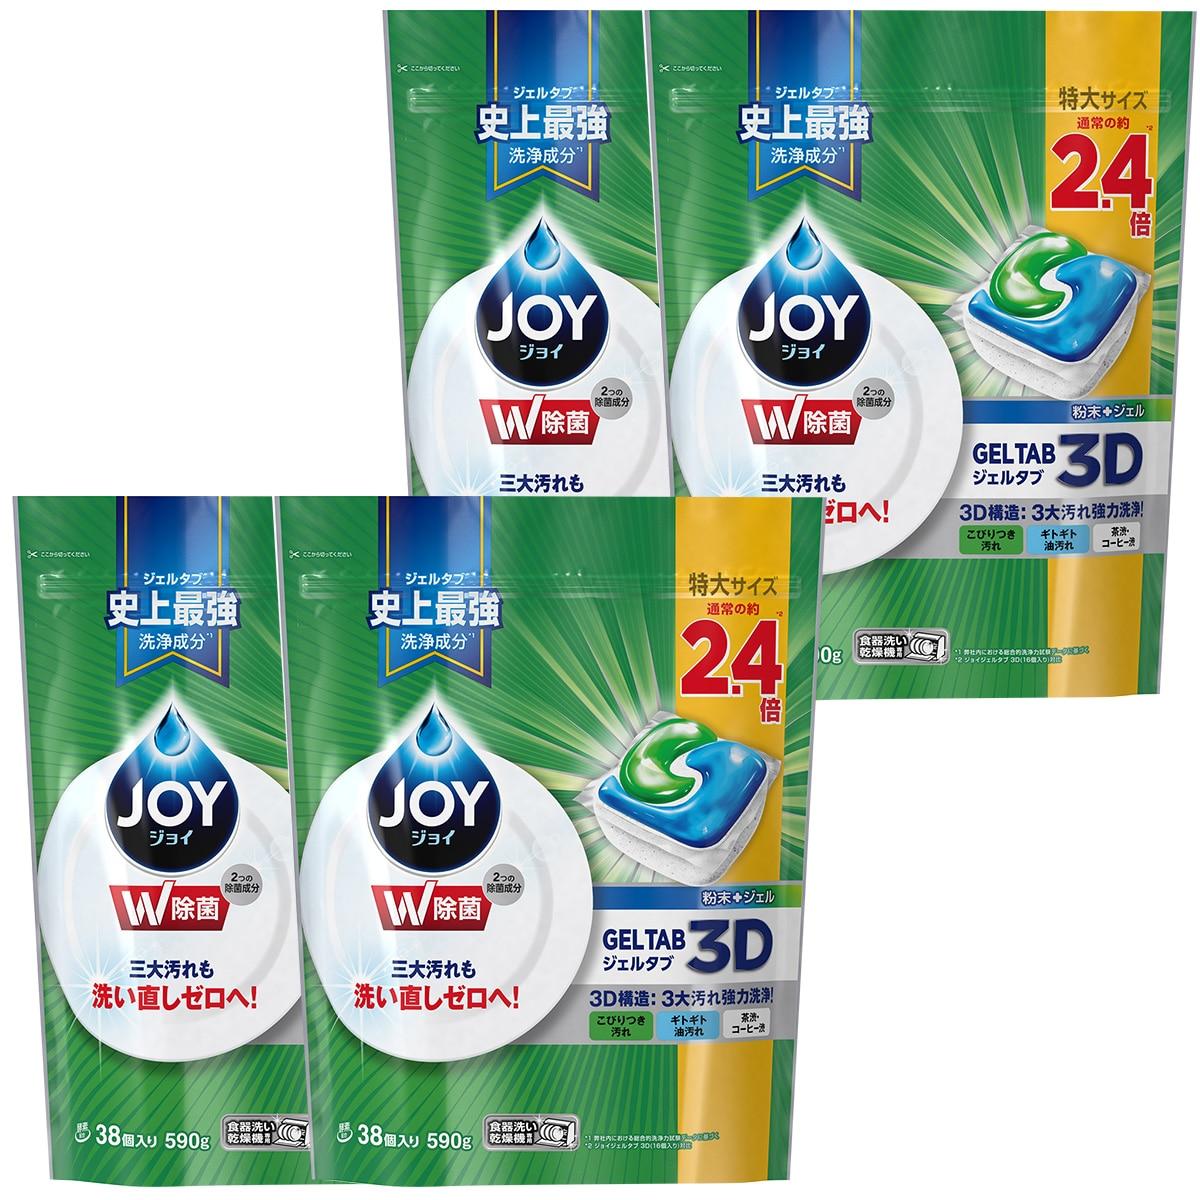 P&G ジョイ ジェルタブ 食洗機用洗剤 38個入×4袋